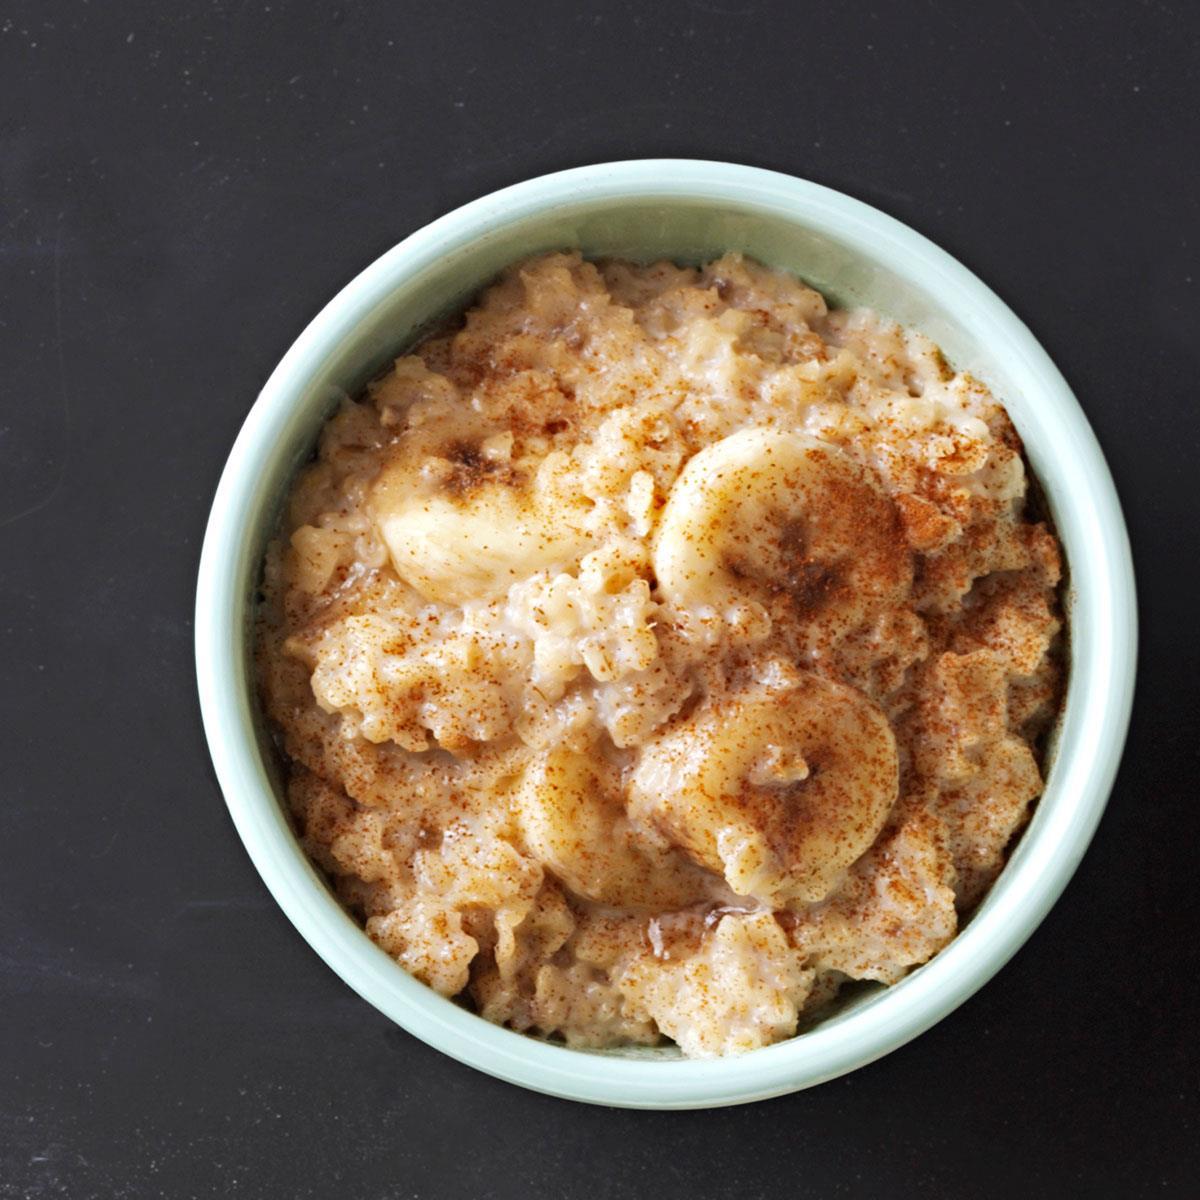 Brown Sugar Banana Oatmeal Recipe How To Make It Taste Of Home